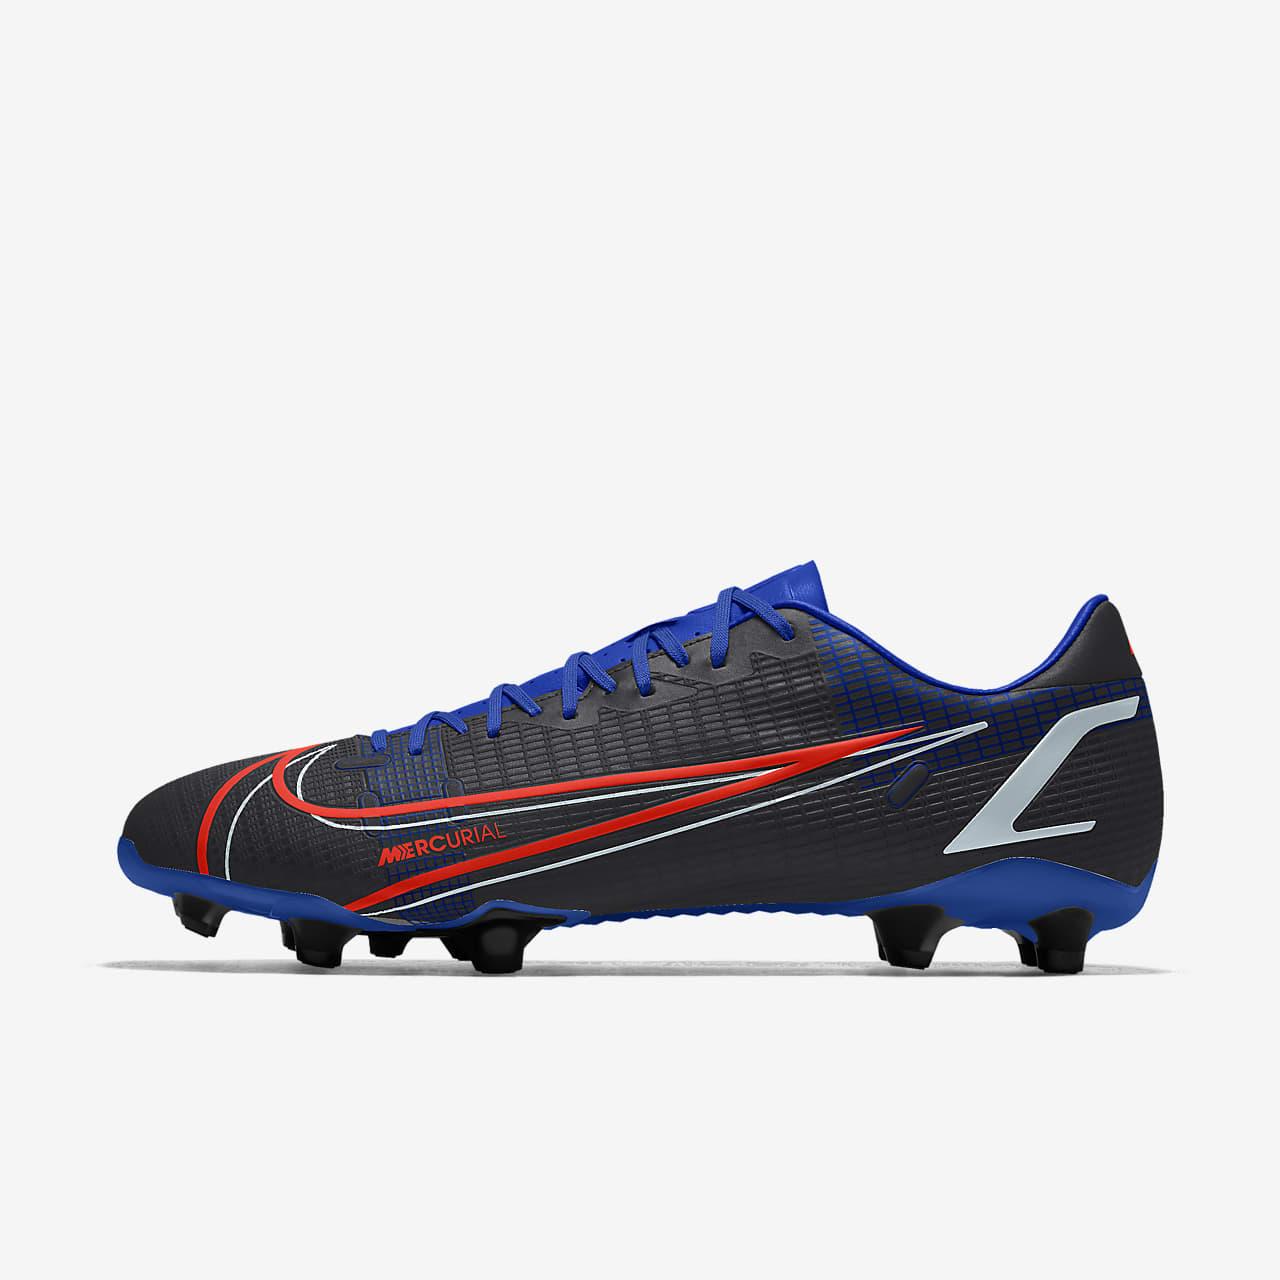 Nike Mercurial Vapor 14 Academy By You Custom Soccer Cleat